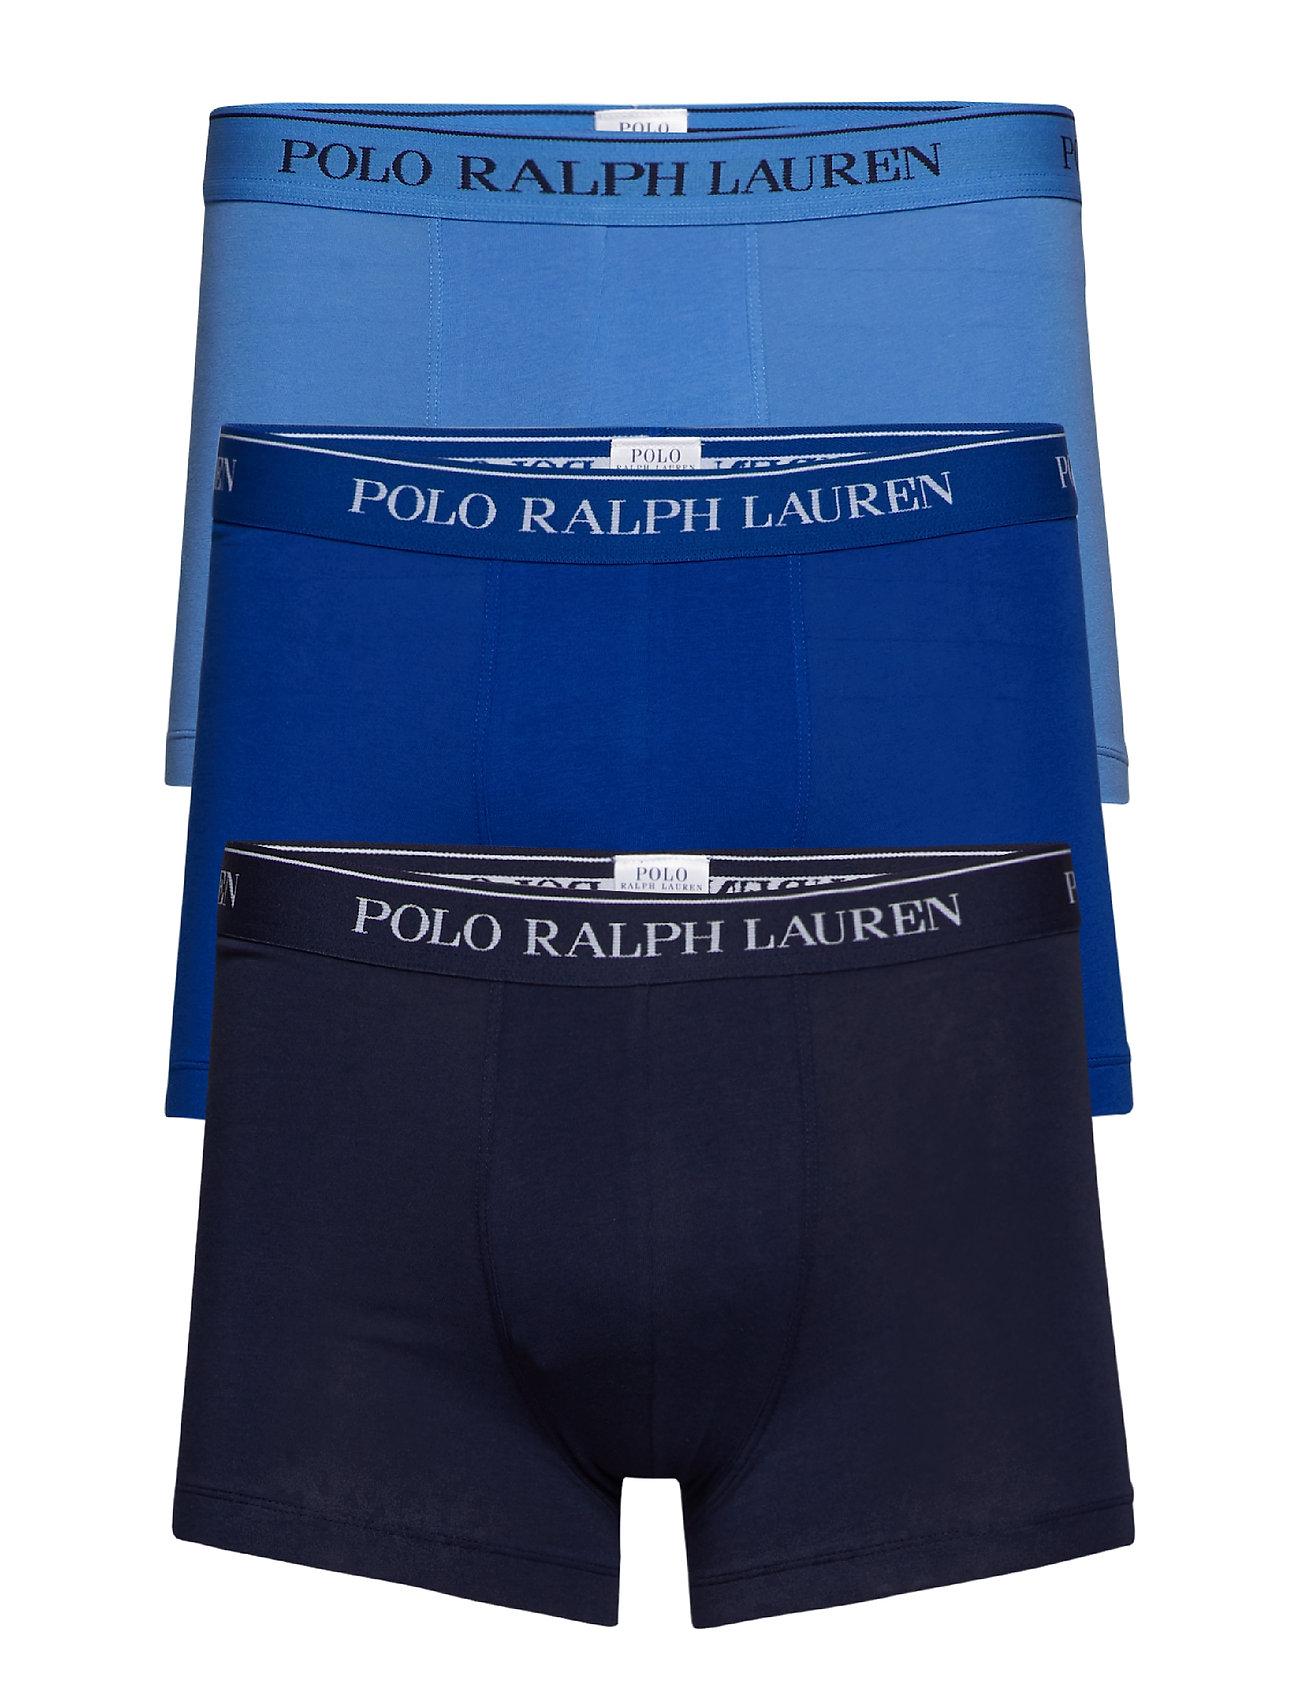 Polo Ralph Lauren Underwear 3 PACKS POUCH TRUNKS